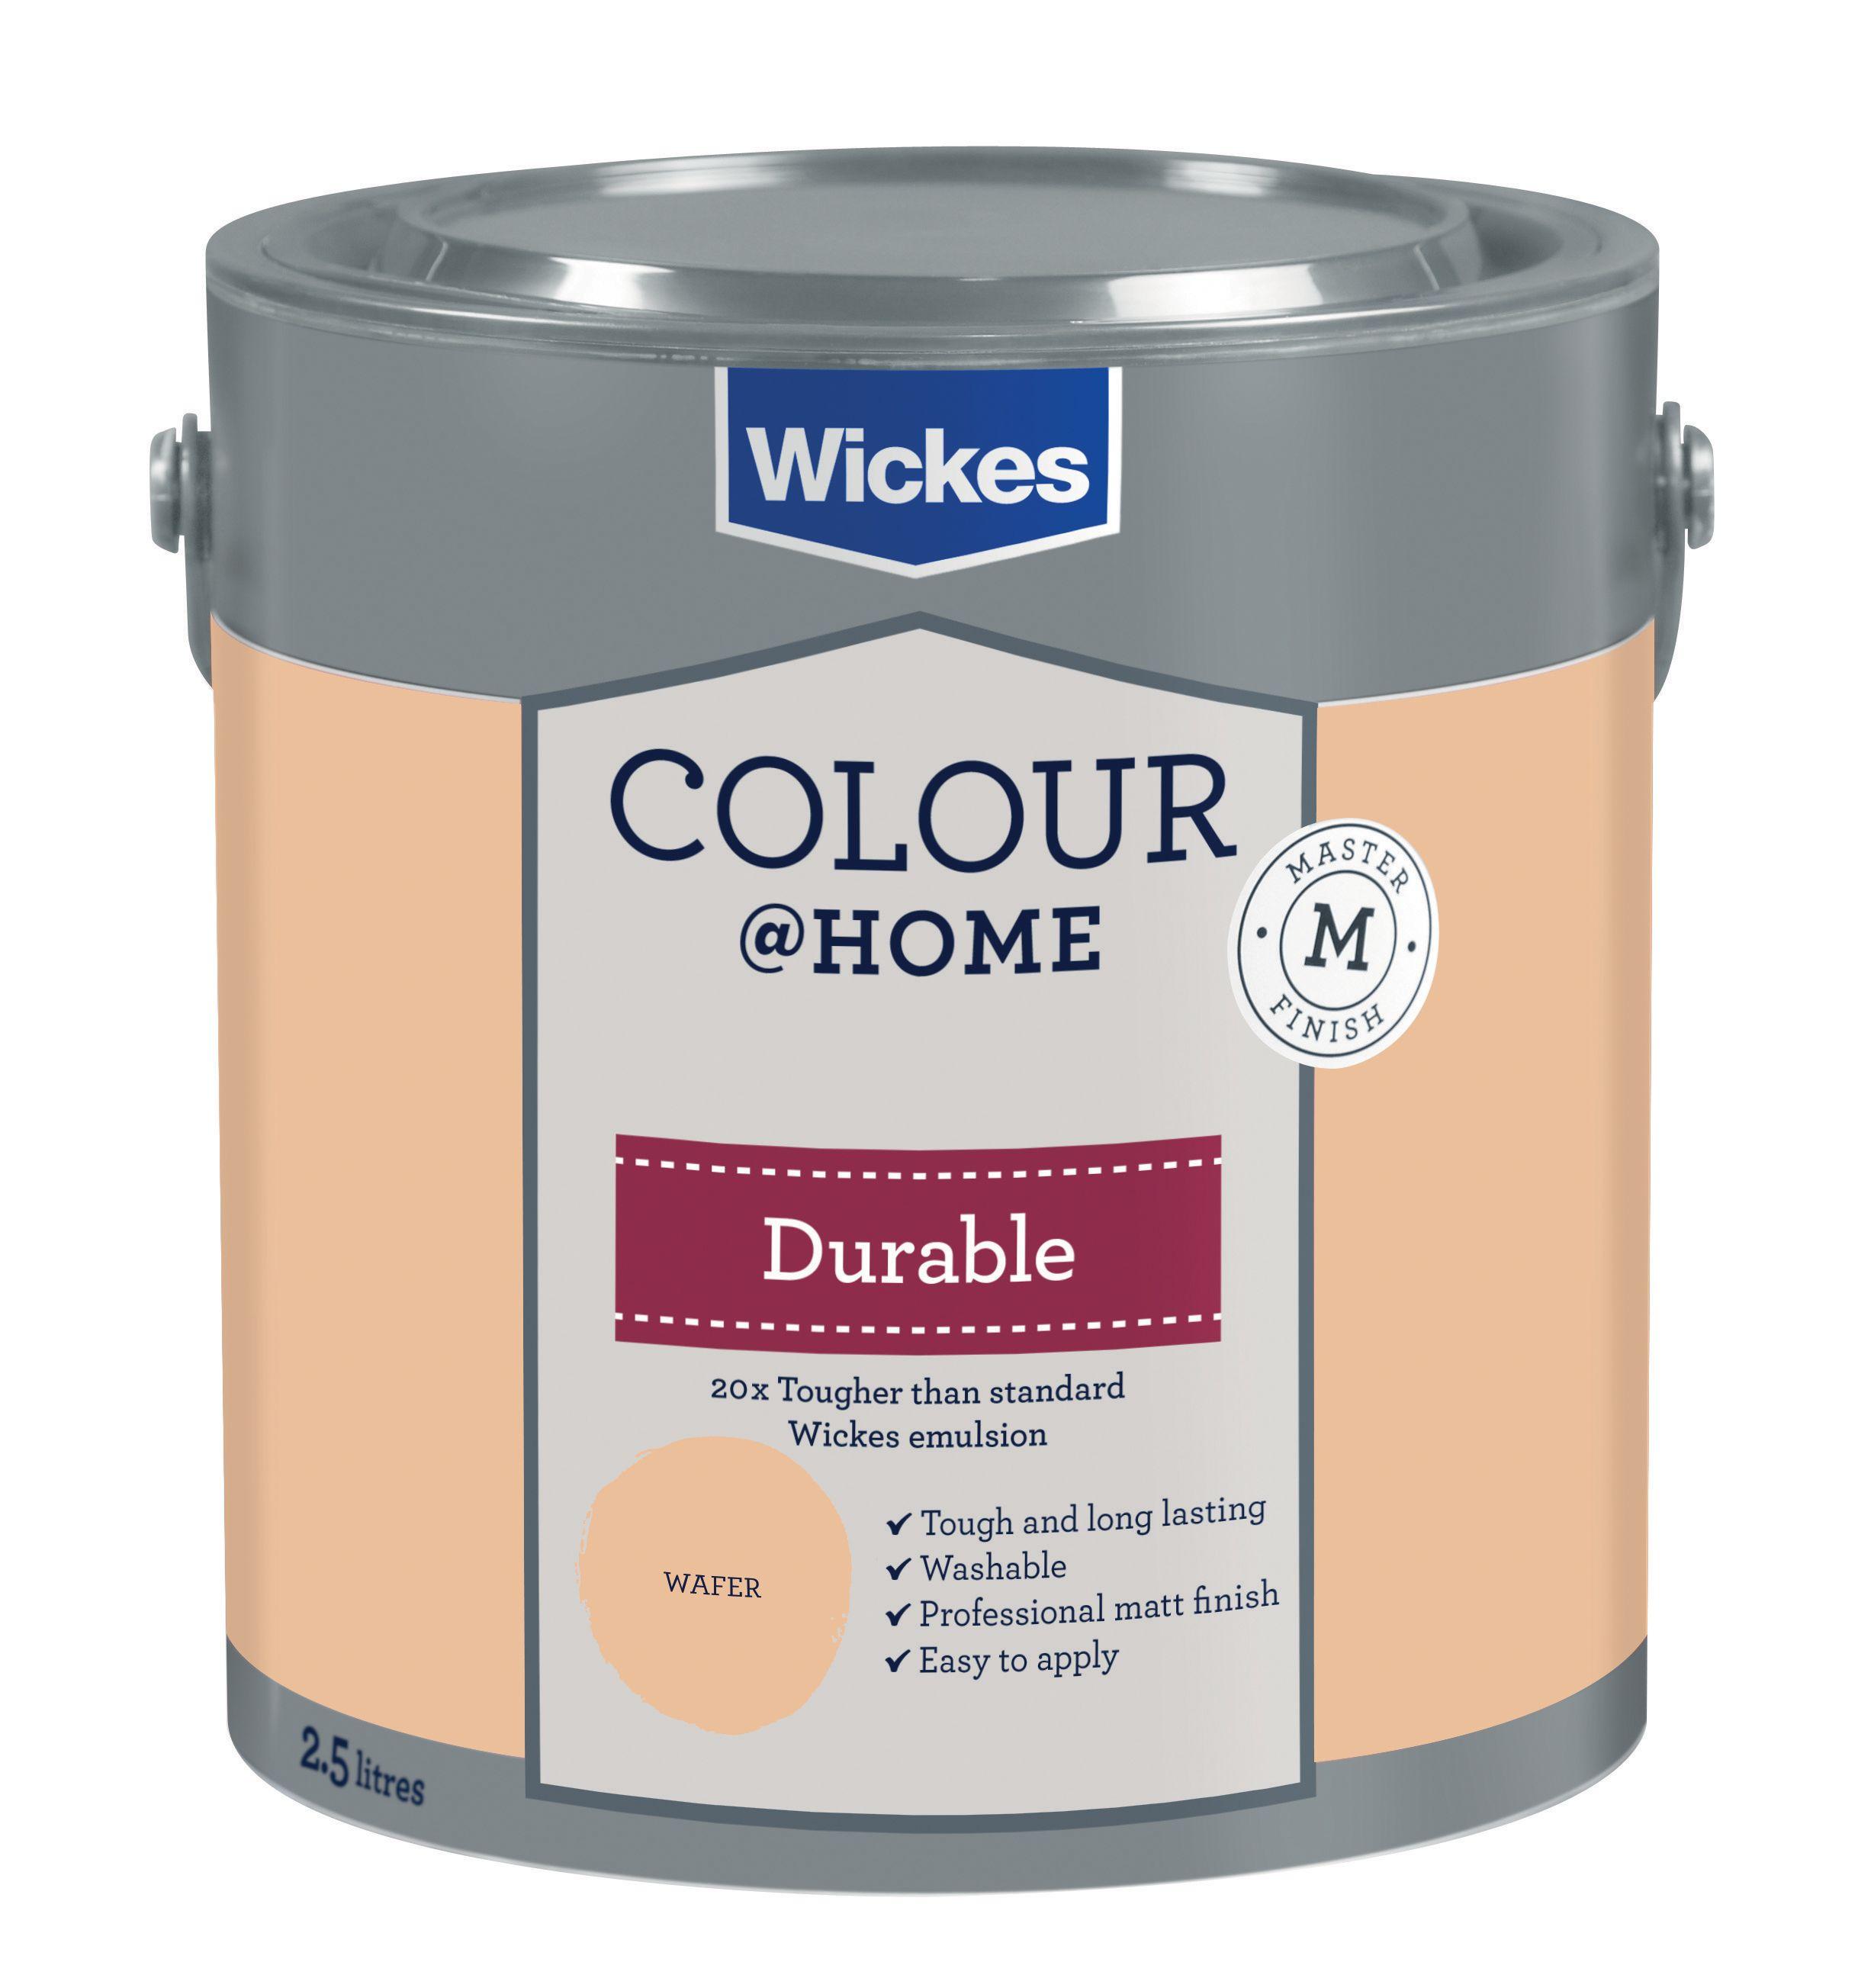 Home Durable Matt Emulsion Paint - Wafer 2.5L for £1 @ Wickes